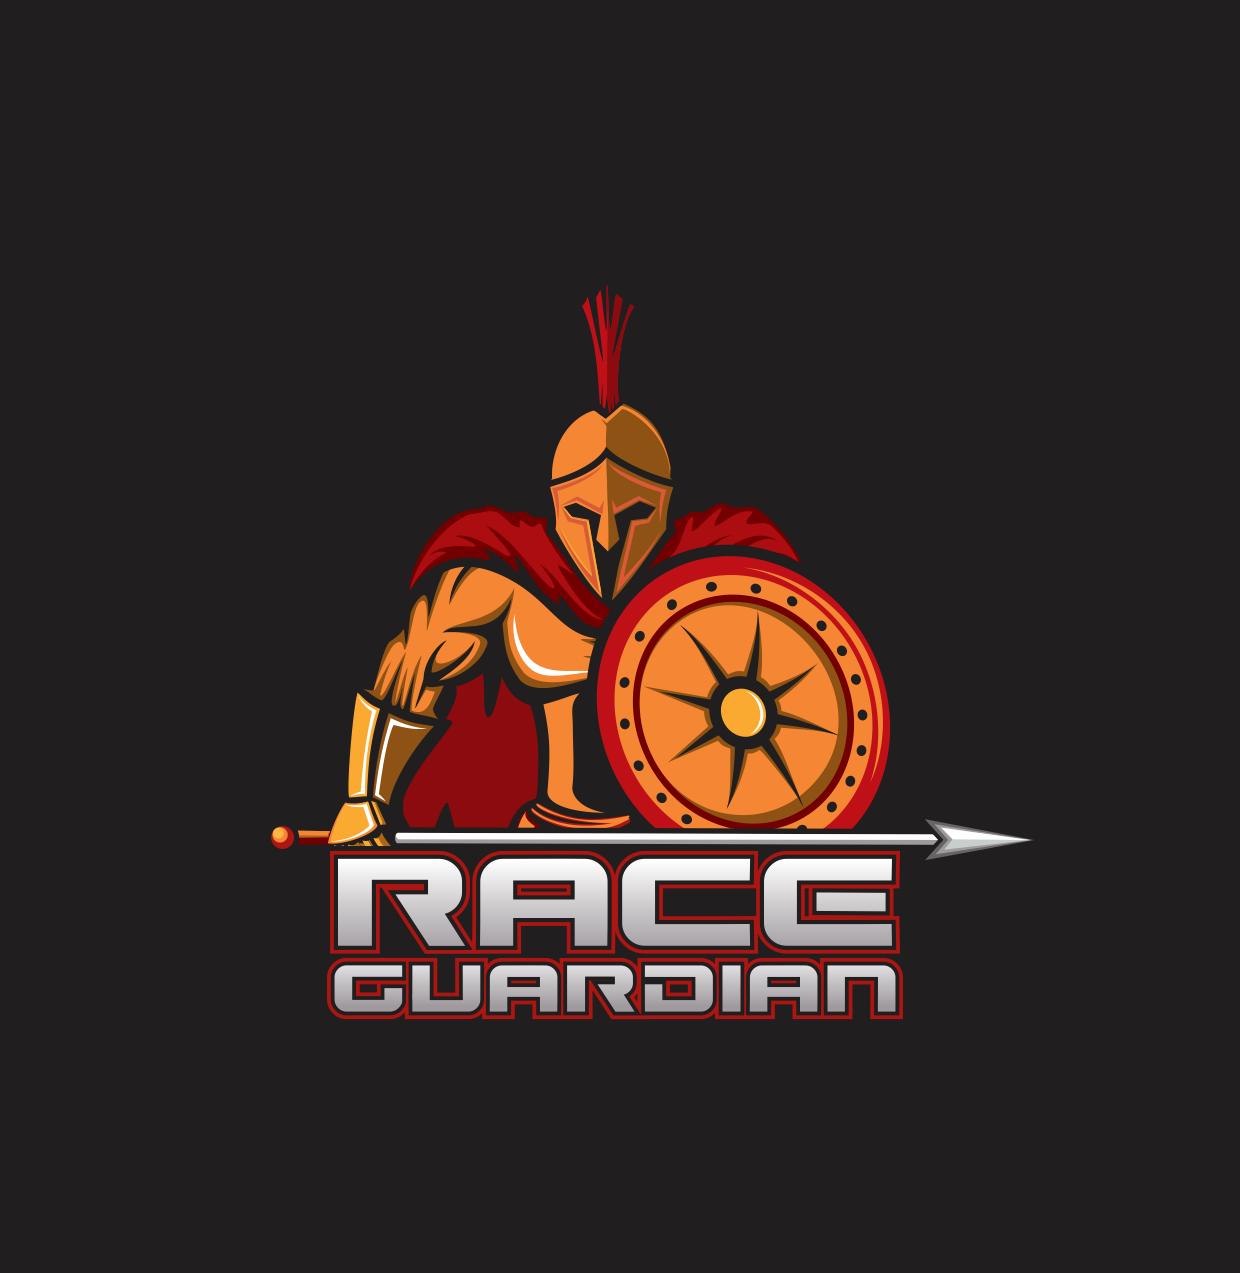 RACE GUARDIAN needs a new logo